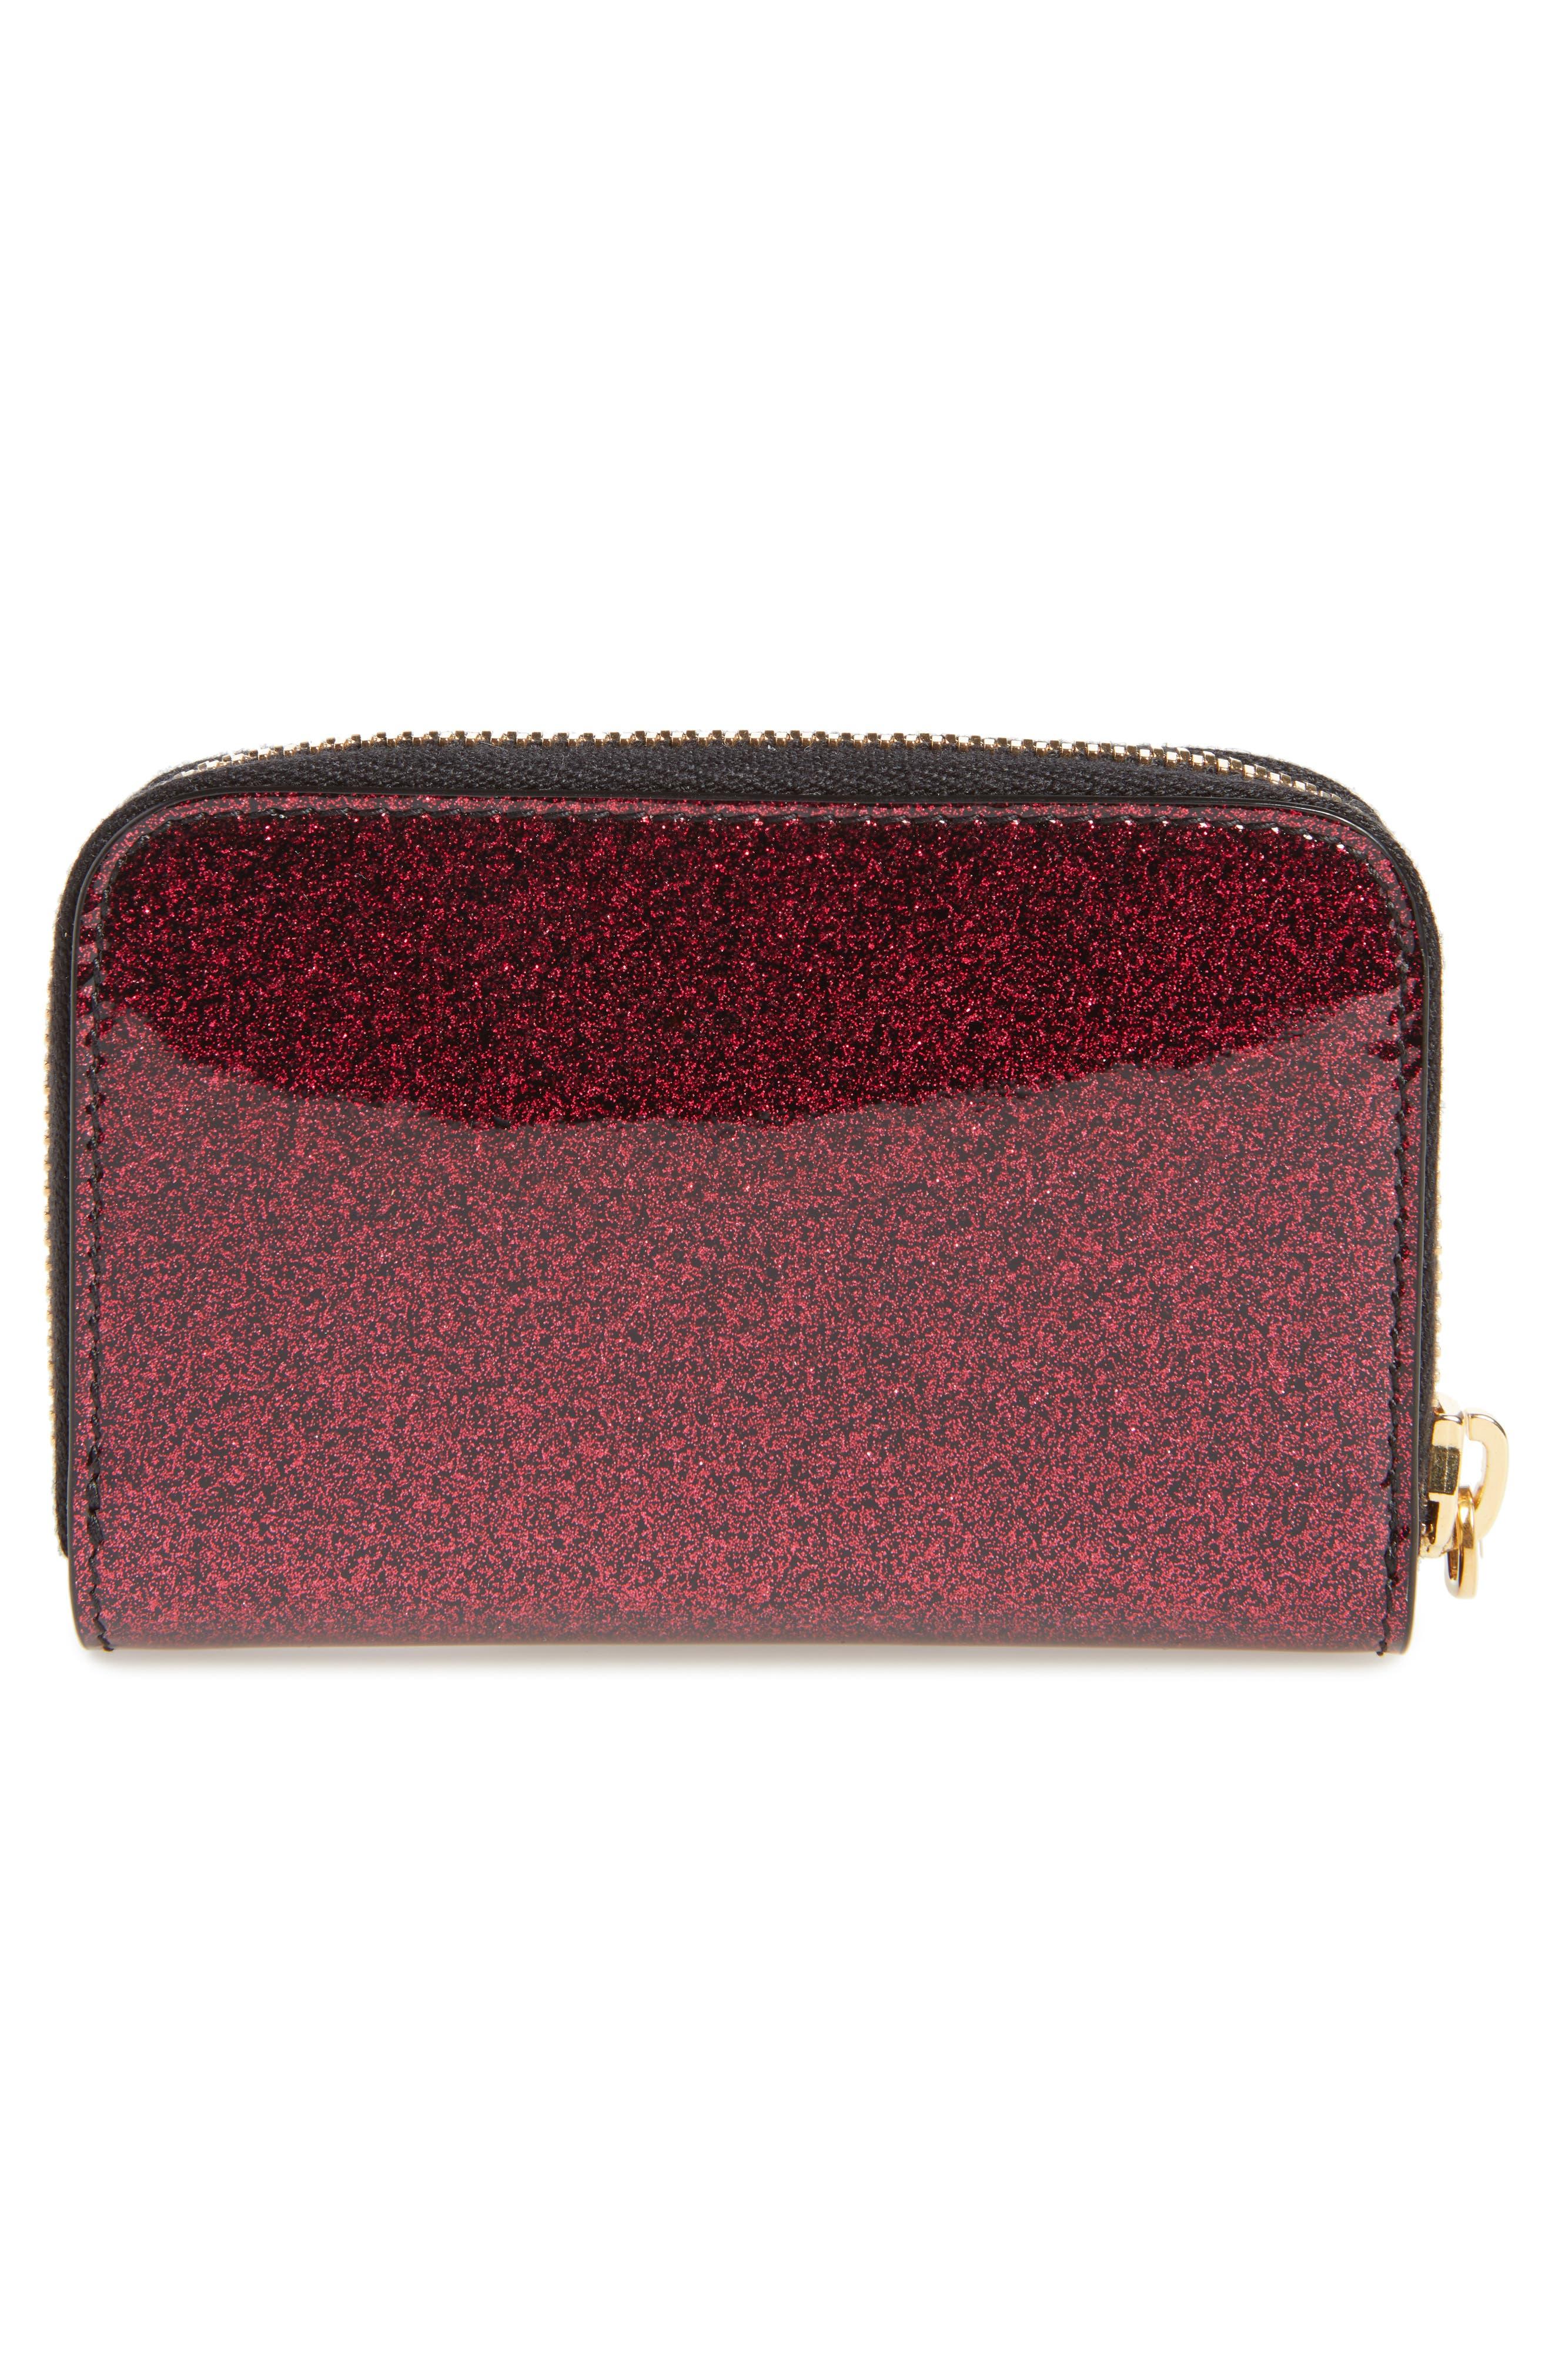 SAINT LAURENT, Glitter Calfskin Leather Wallet, Alternate thumbnail 4, color, SHOCKING PINK/ NOIR